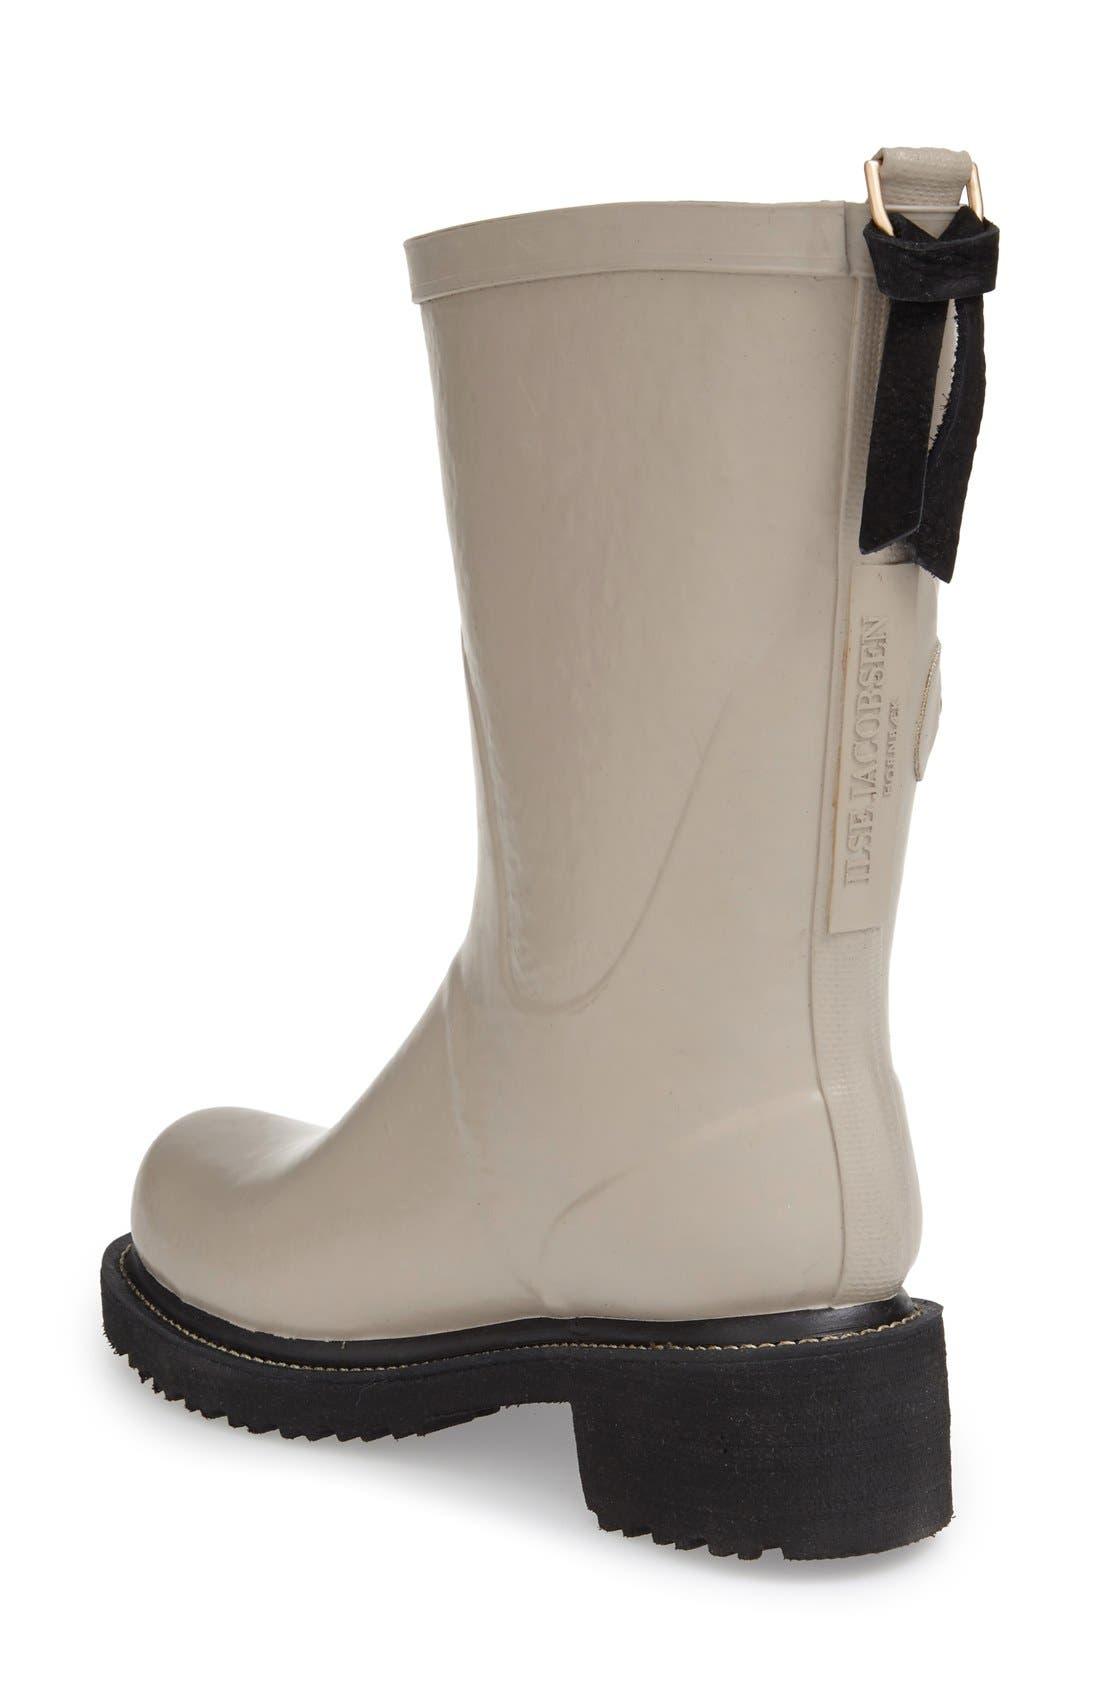 Waterproof Buckle Detail Snow/Rain Boot,                             Alternate thumbnail 4, color,